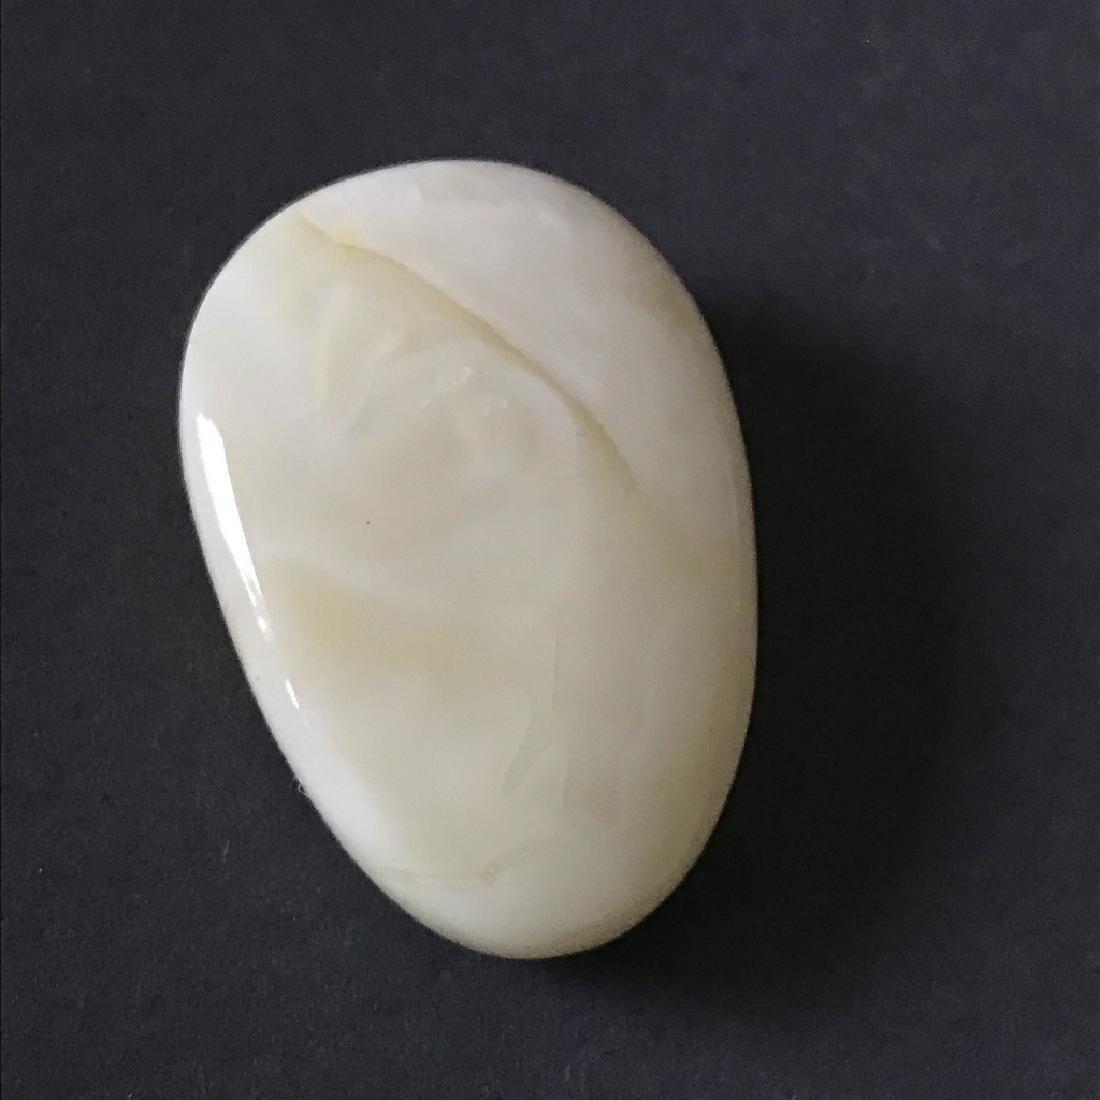 Rare white Baltic amber cabochon 38x26x10mm - 6